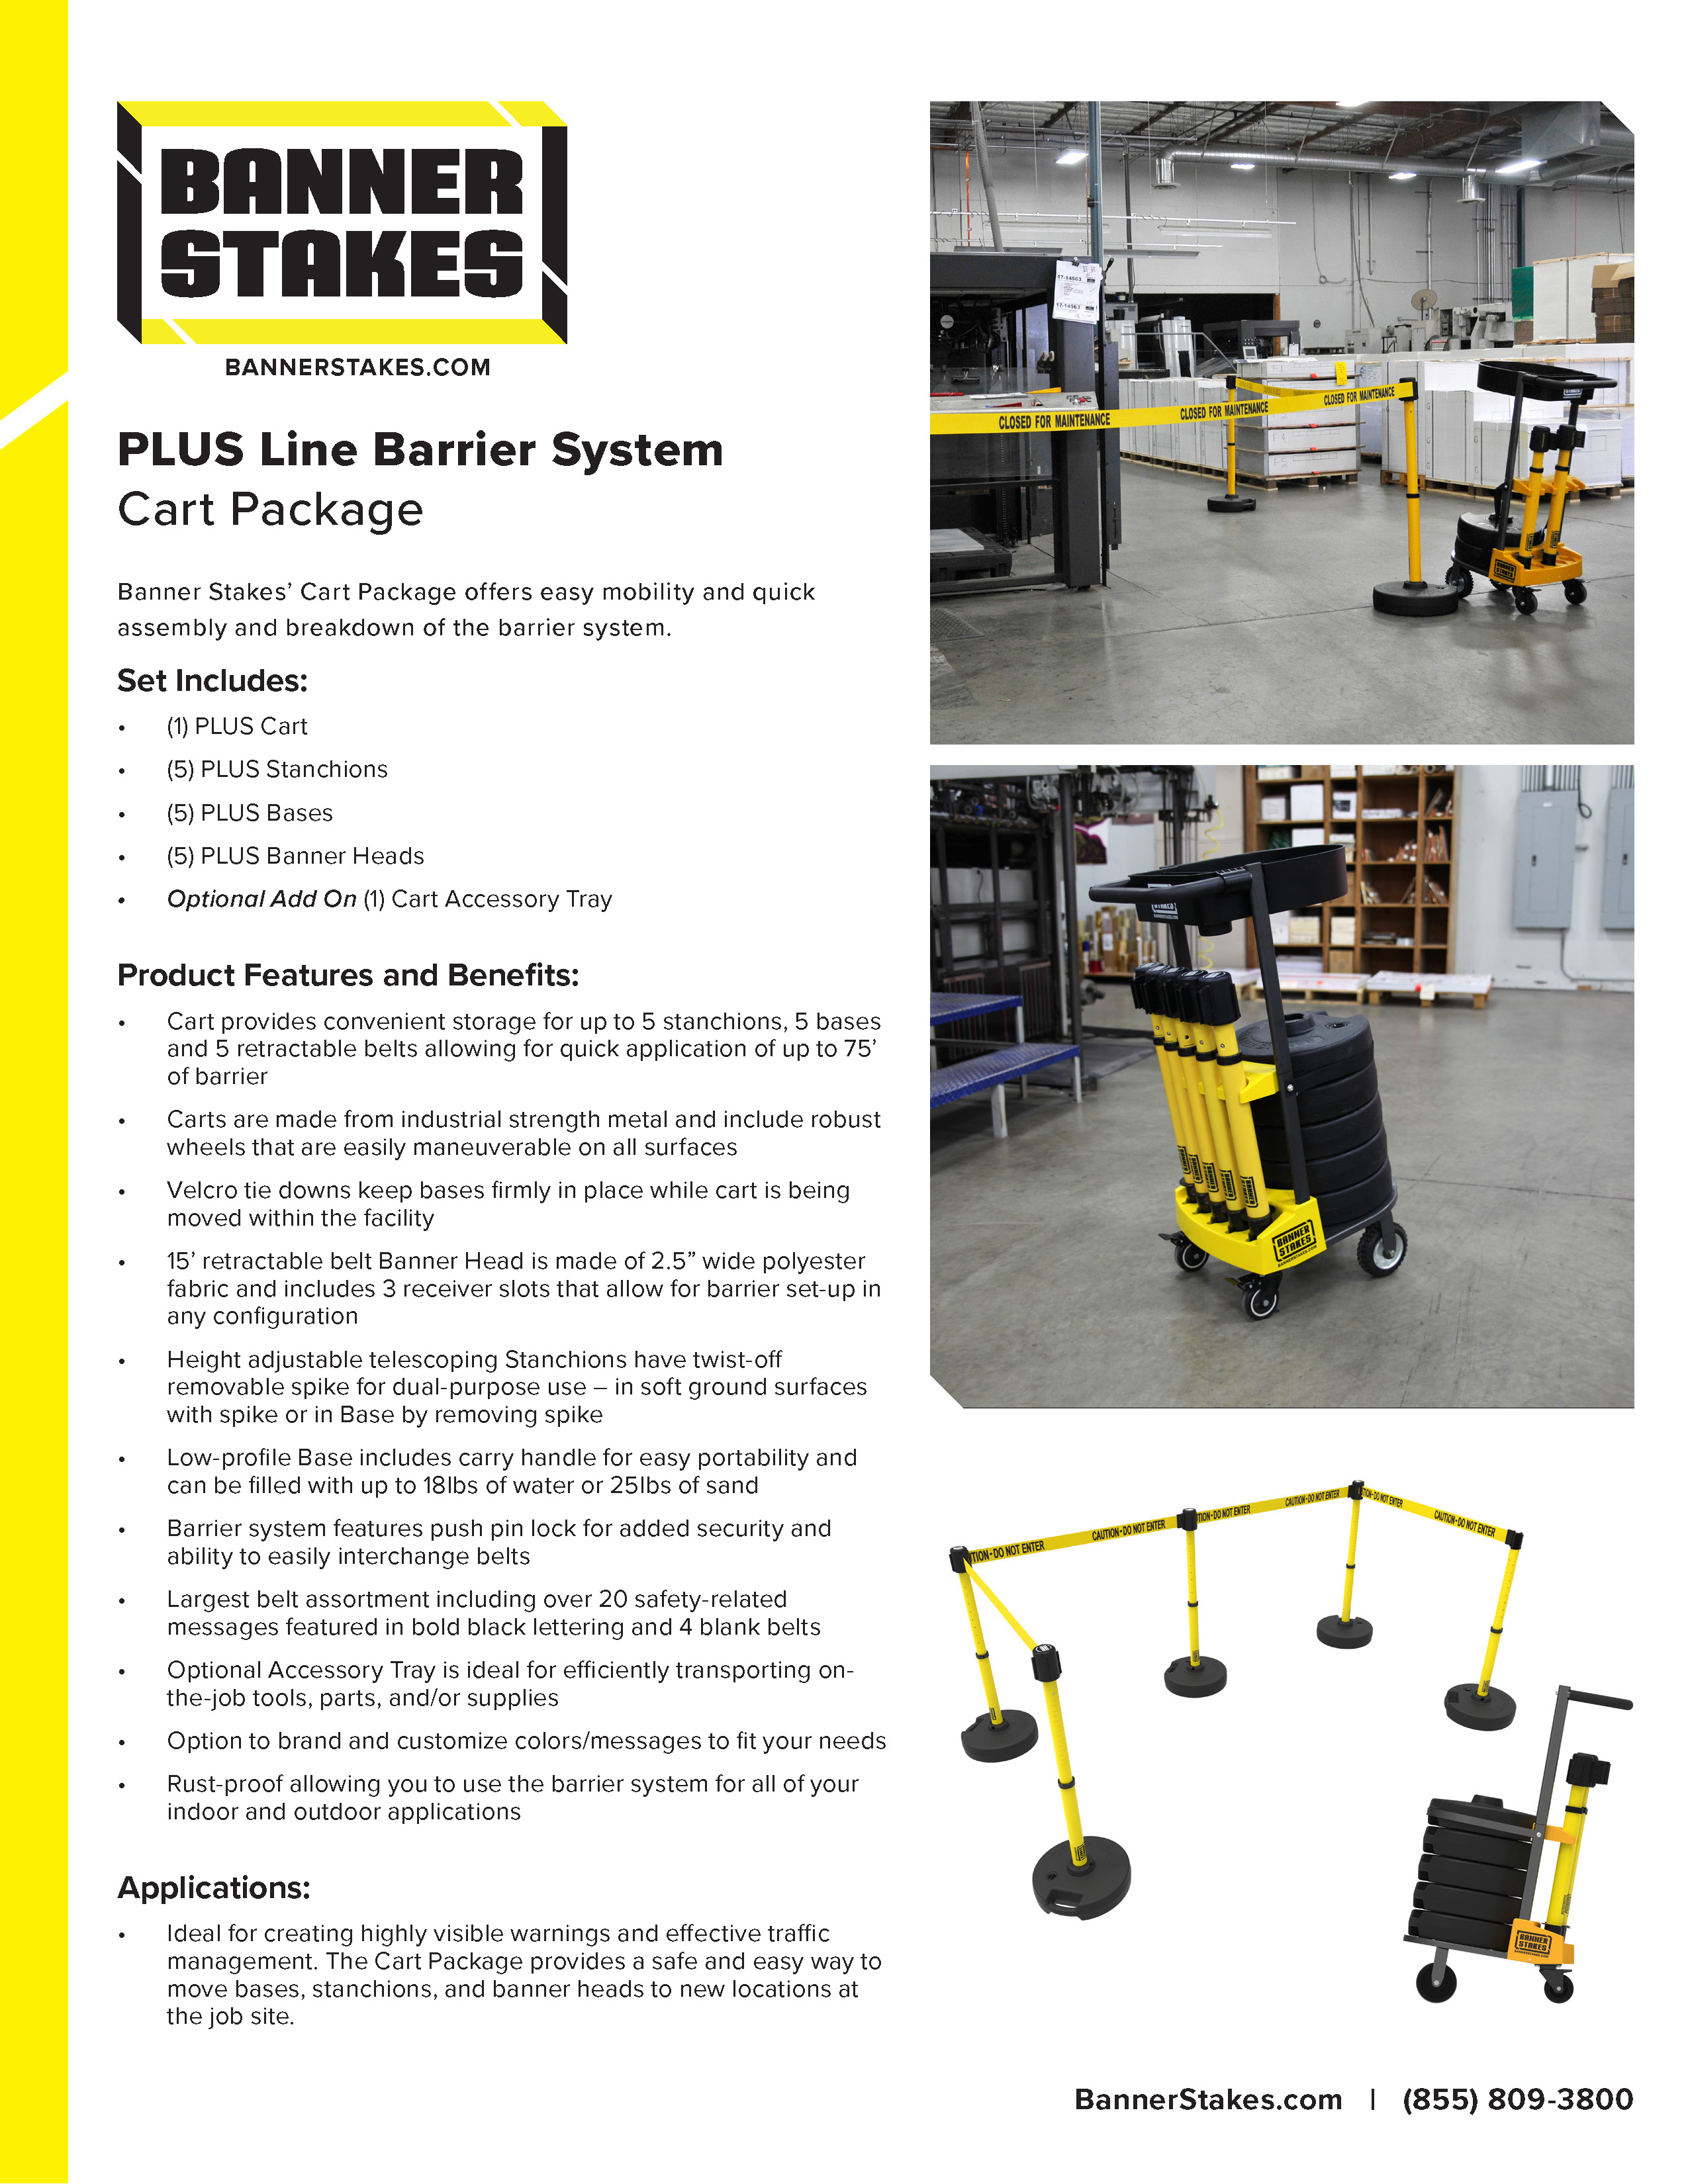 Cart Package